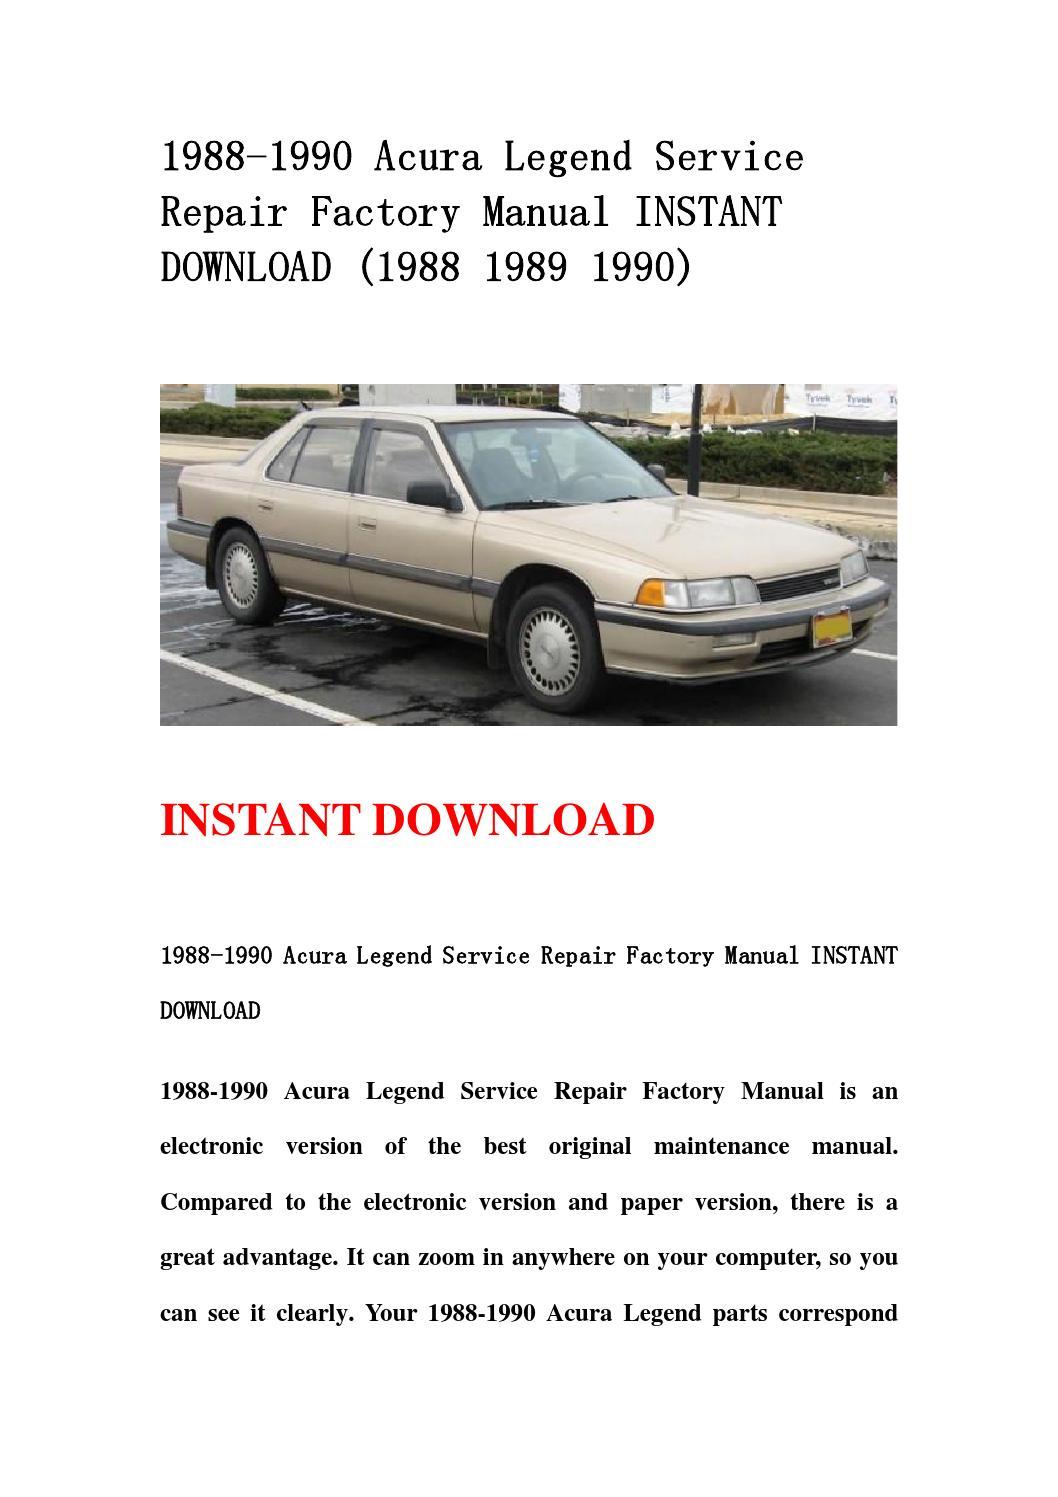 1988 1990 acura legend service repair factory manual 2001 Acura Legend 1996 Acura Legend